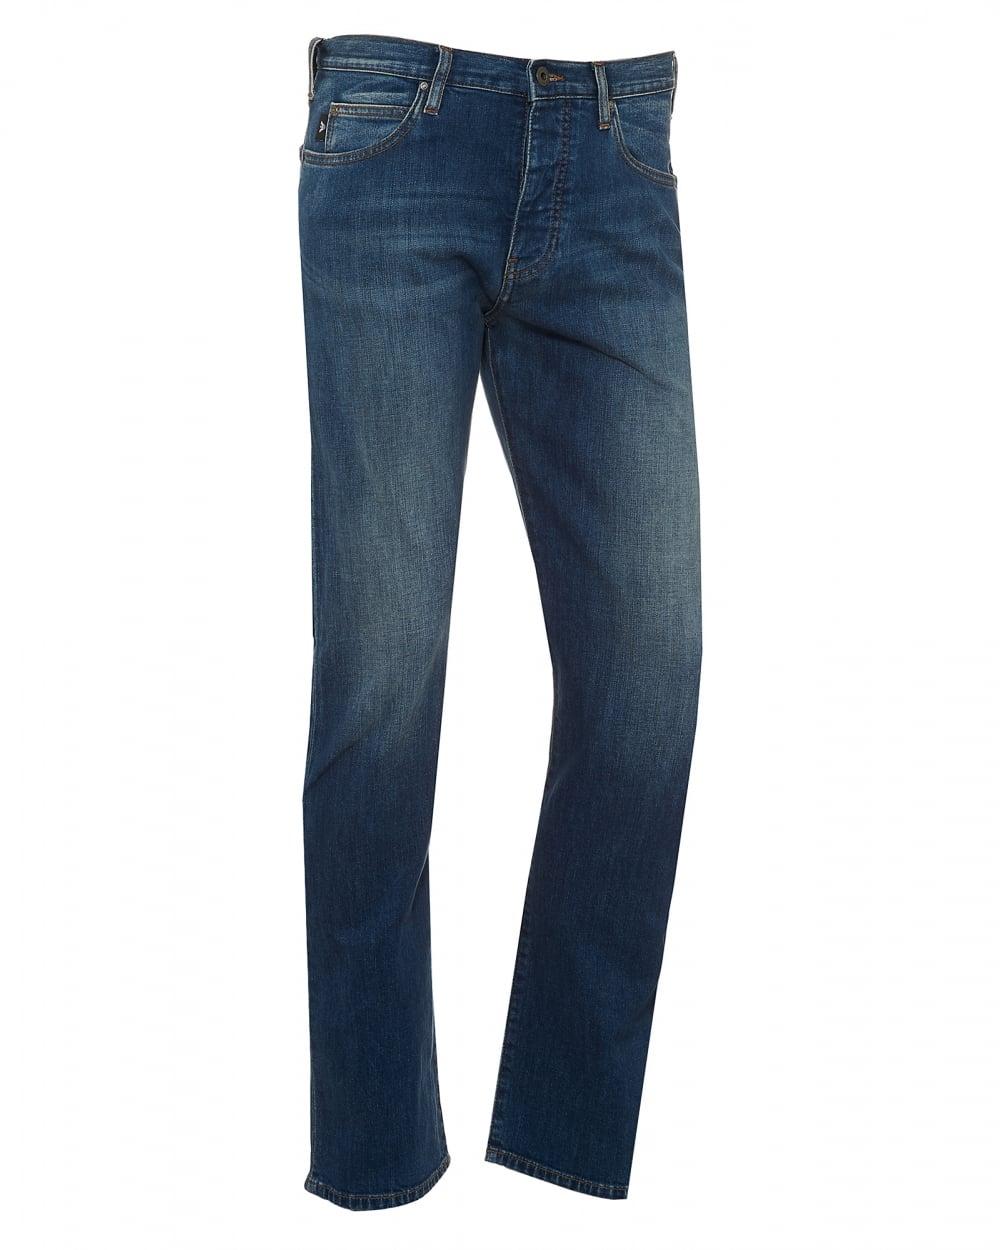 4663b137d5 Emporio Armani Mens J21 Jeans